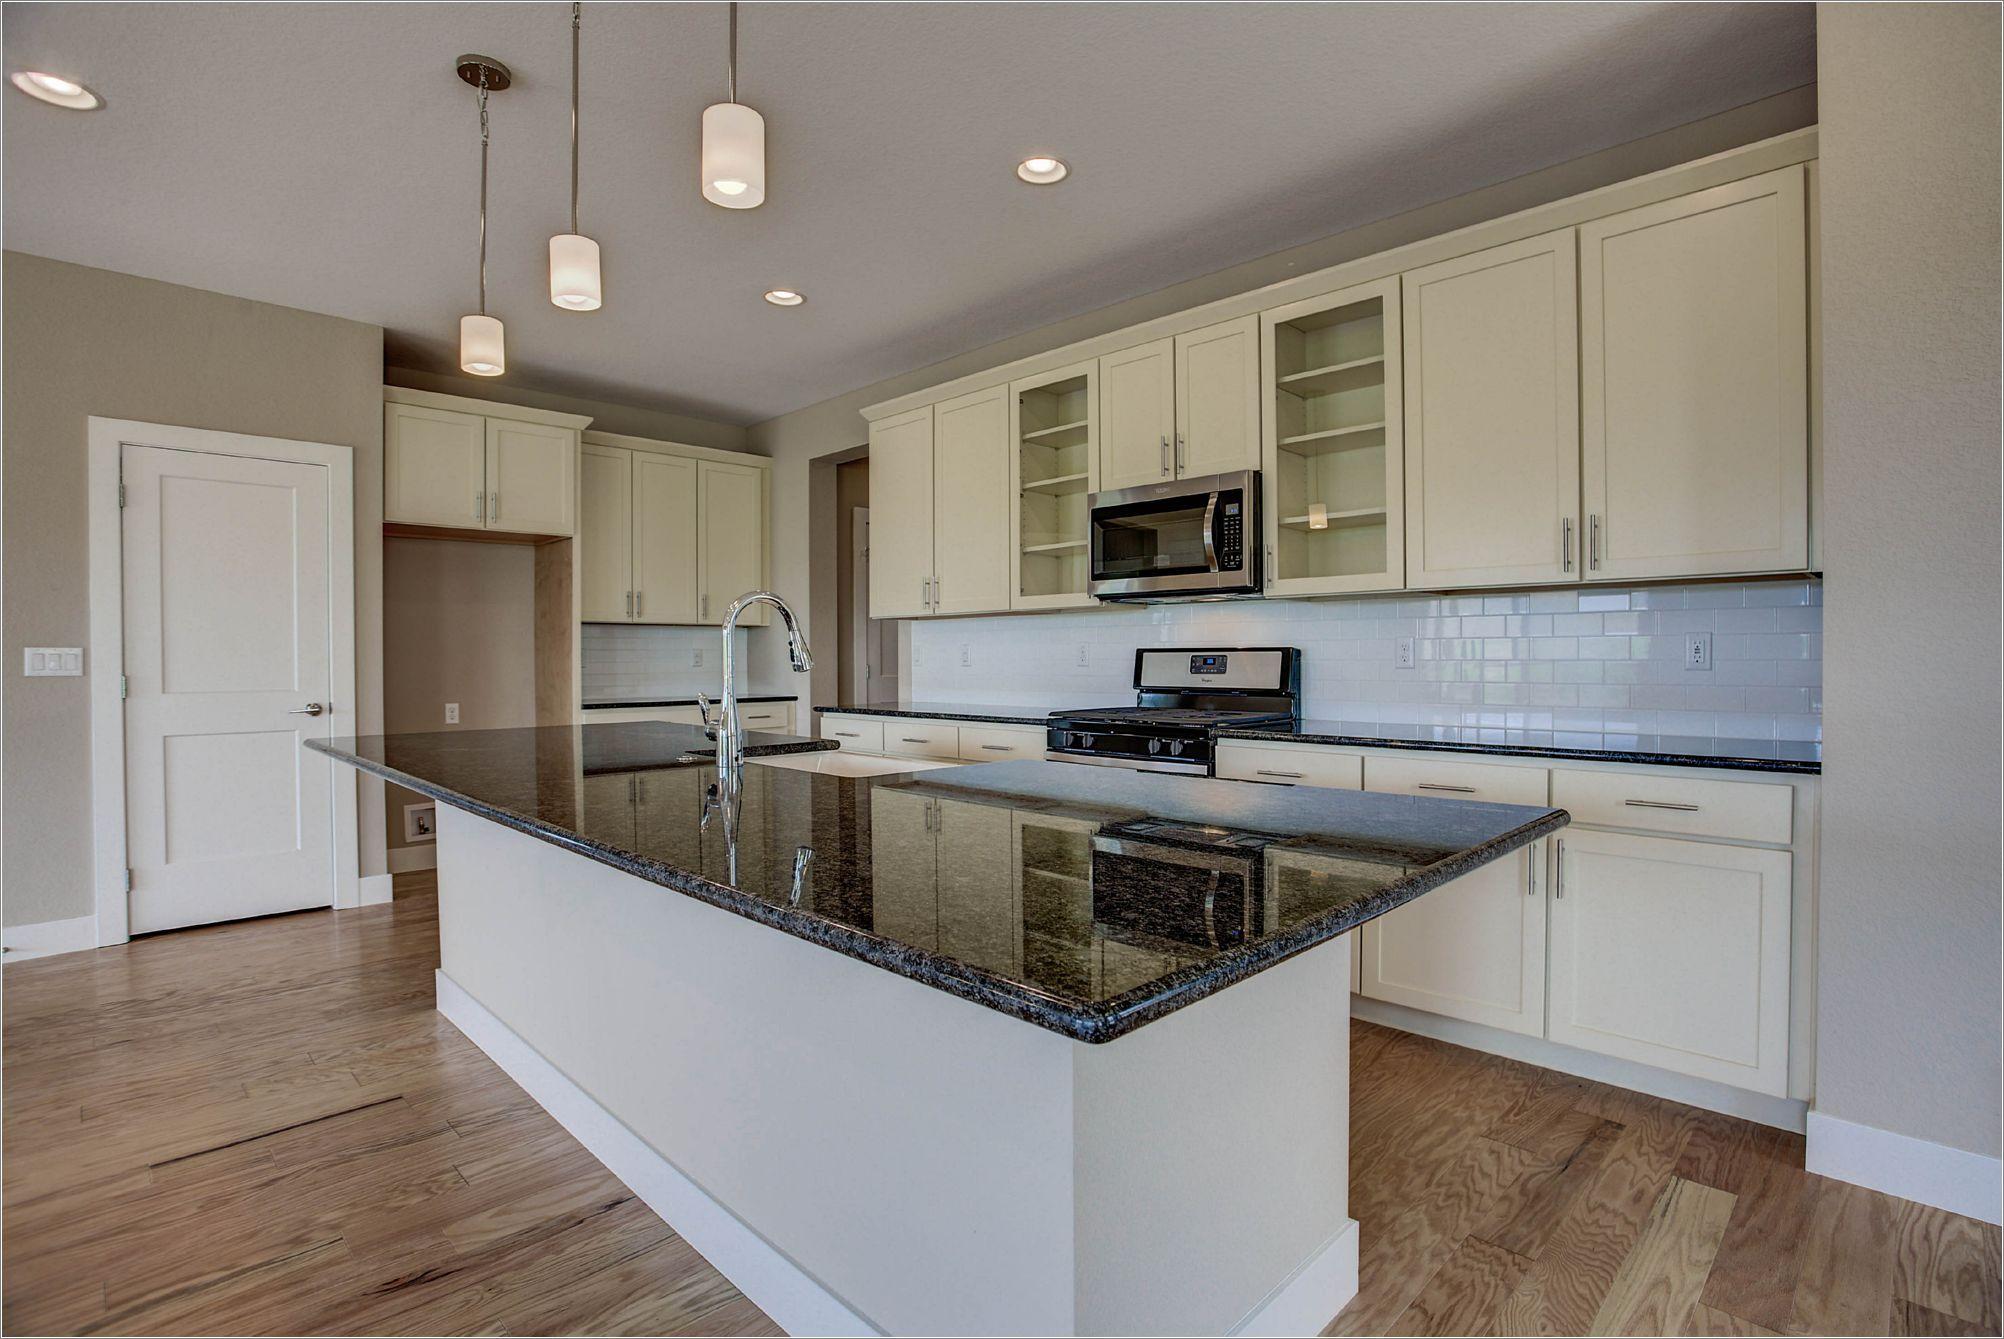 Kitchen featured in the Fairway Villa I By Koelbel Mountain Communities in Boulder-Longmont, CO